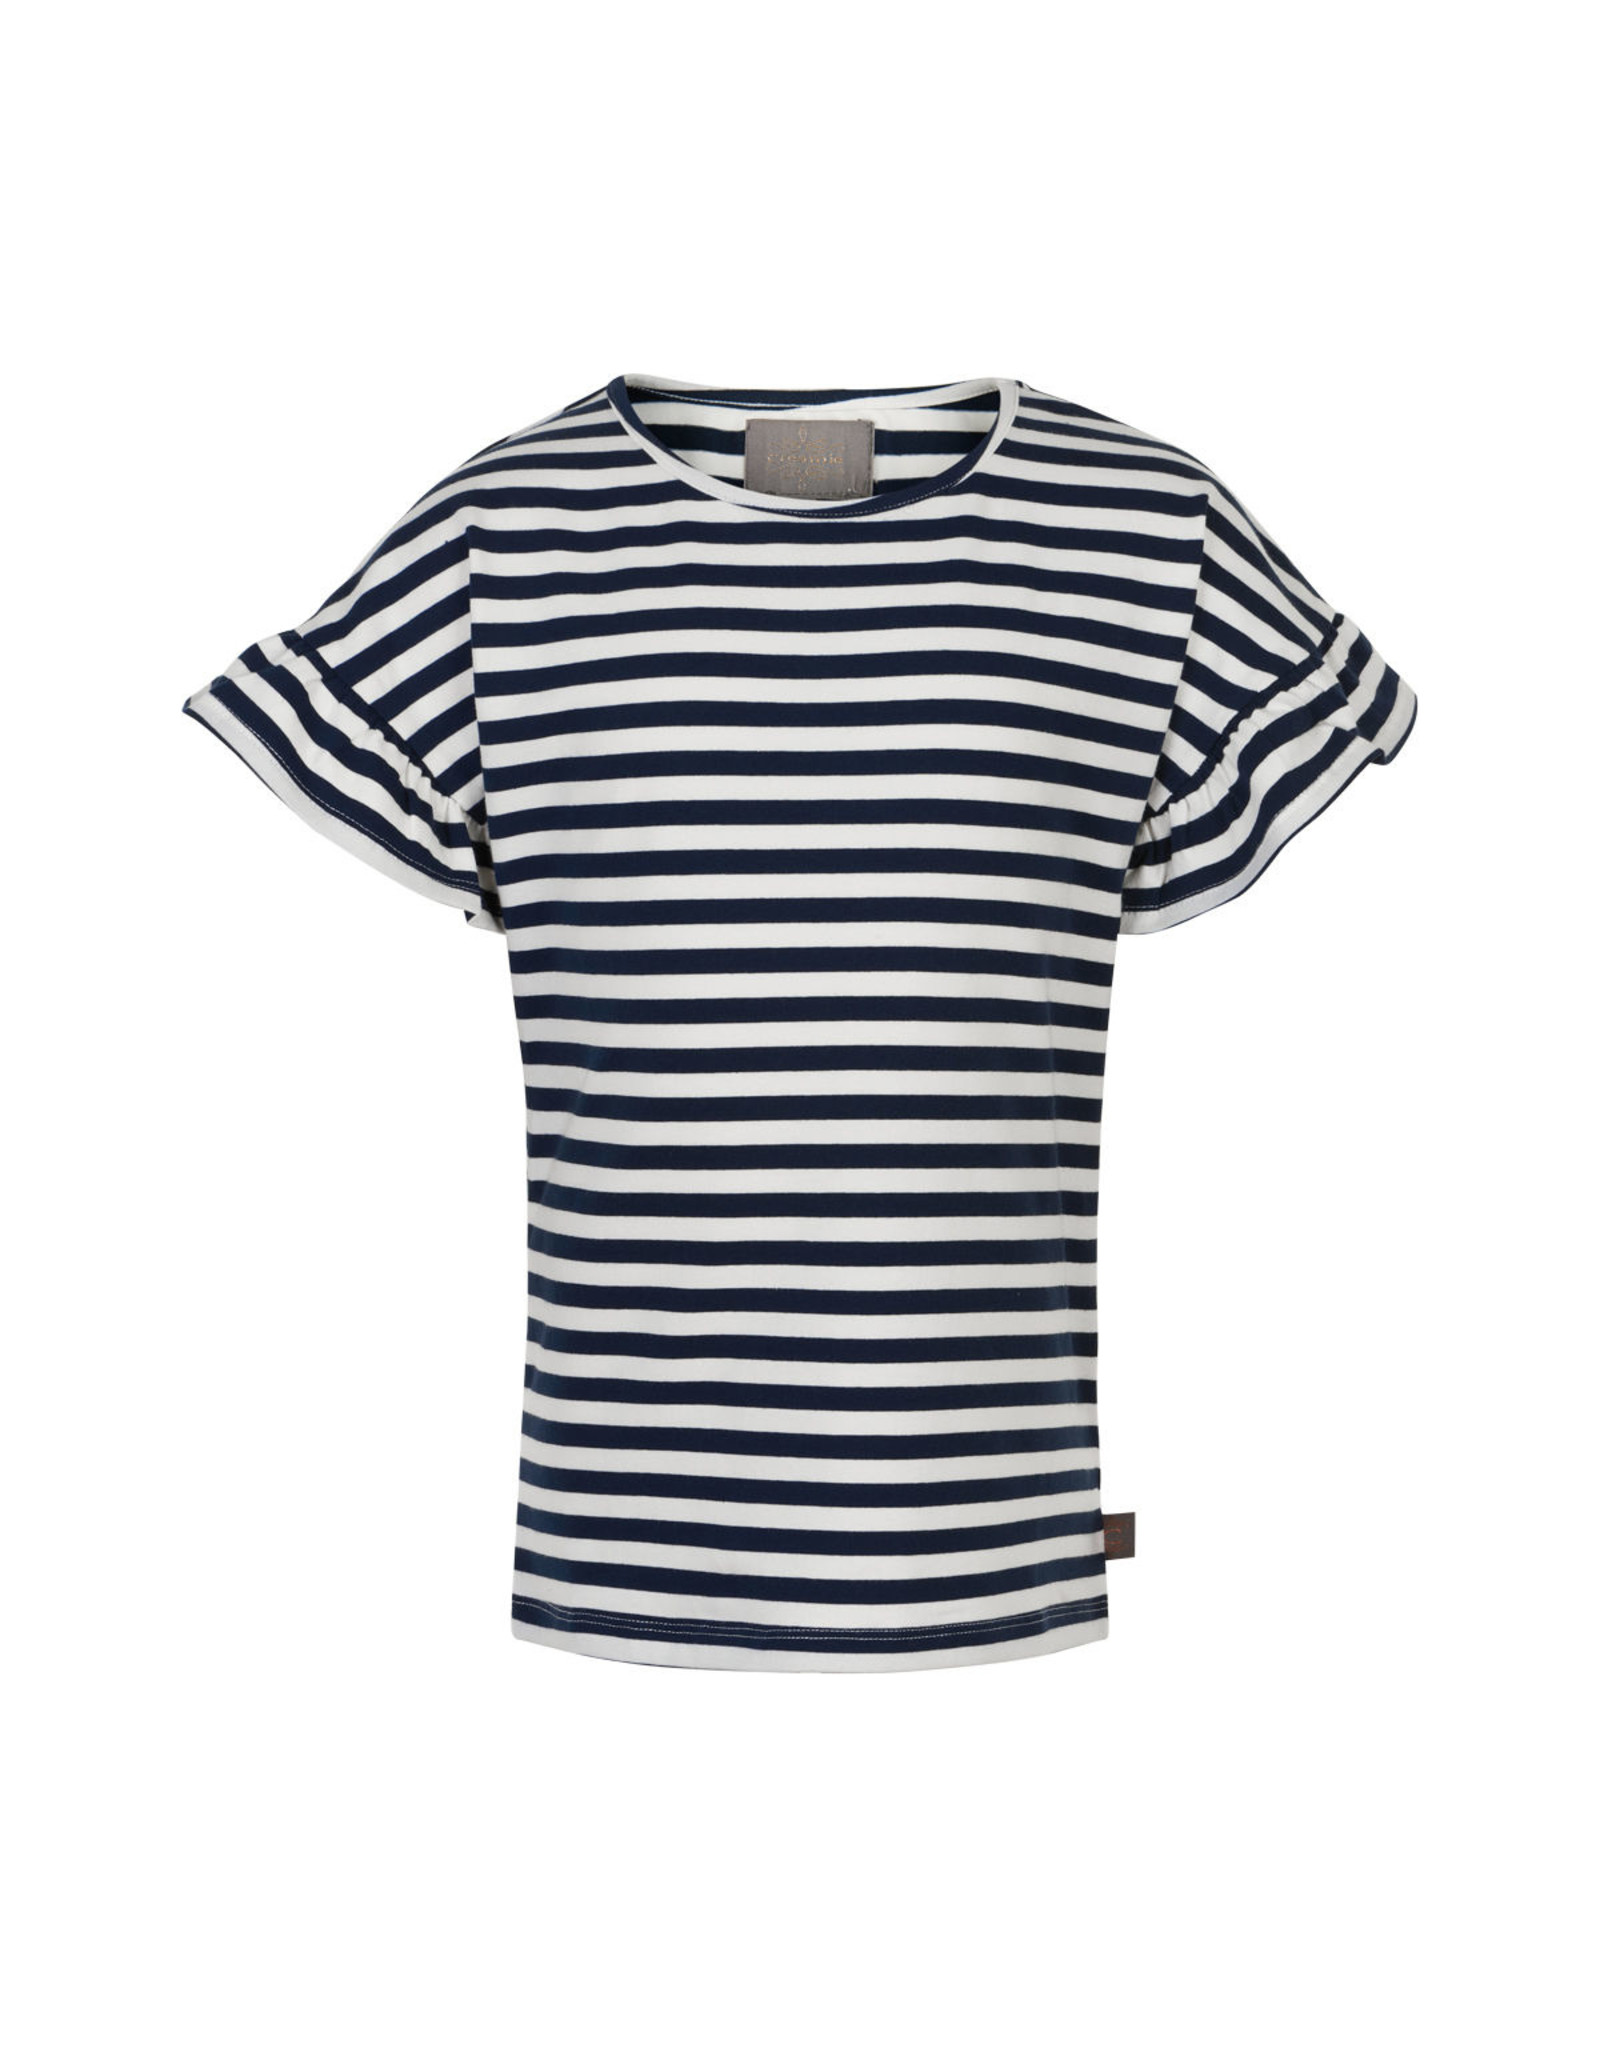 Creamie Creamie T-shirt Stripe short sleeve Total Eclipse